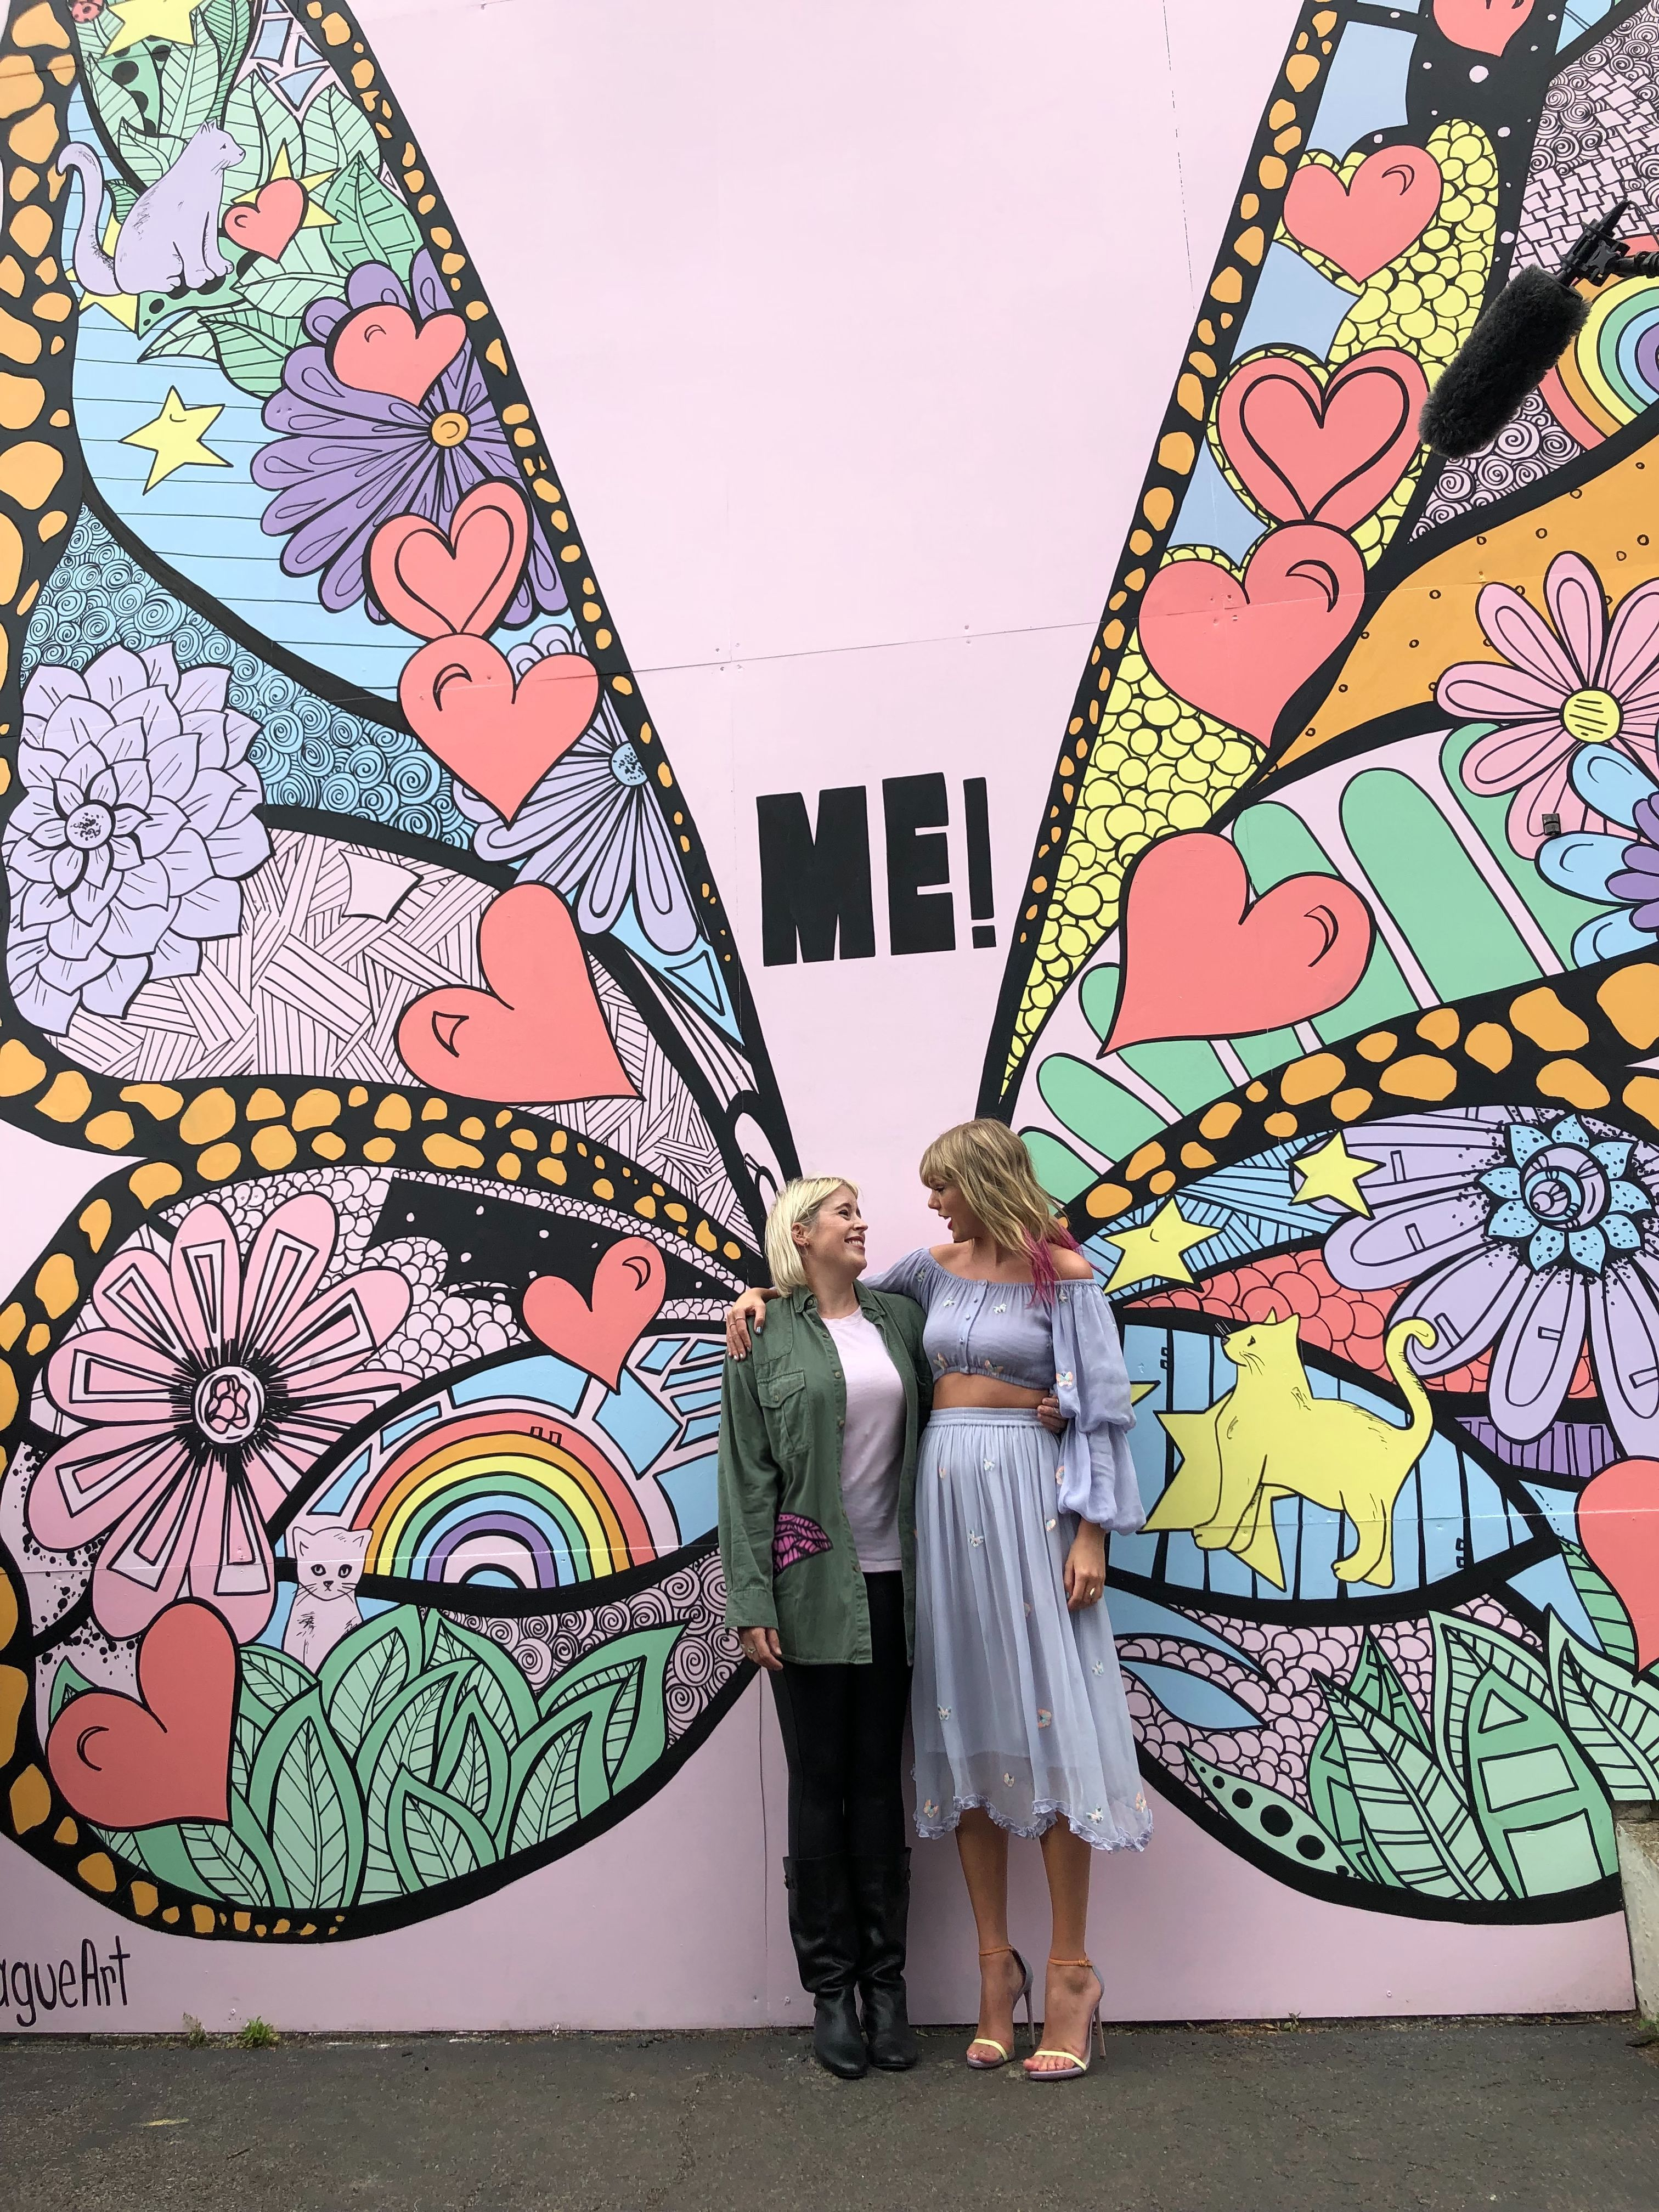 The Artist Behind The Butterfly Mural Had No Idea It Was For Taylor Swift Nashville Murals Mural Wall Art Mural Art